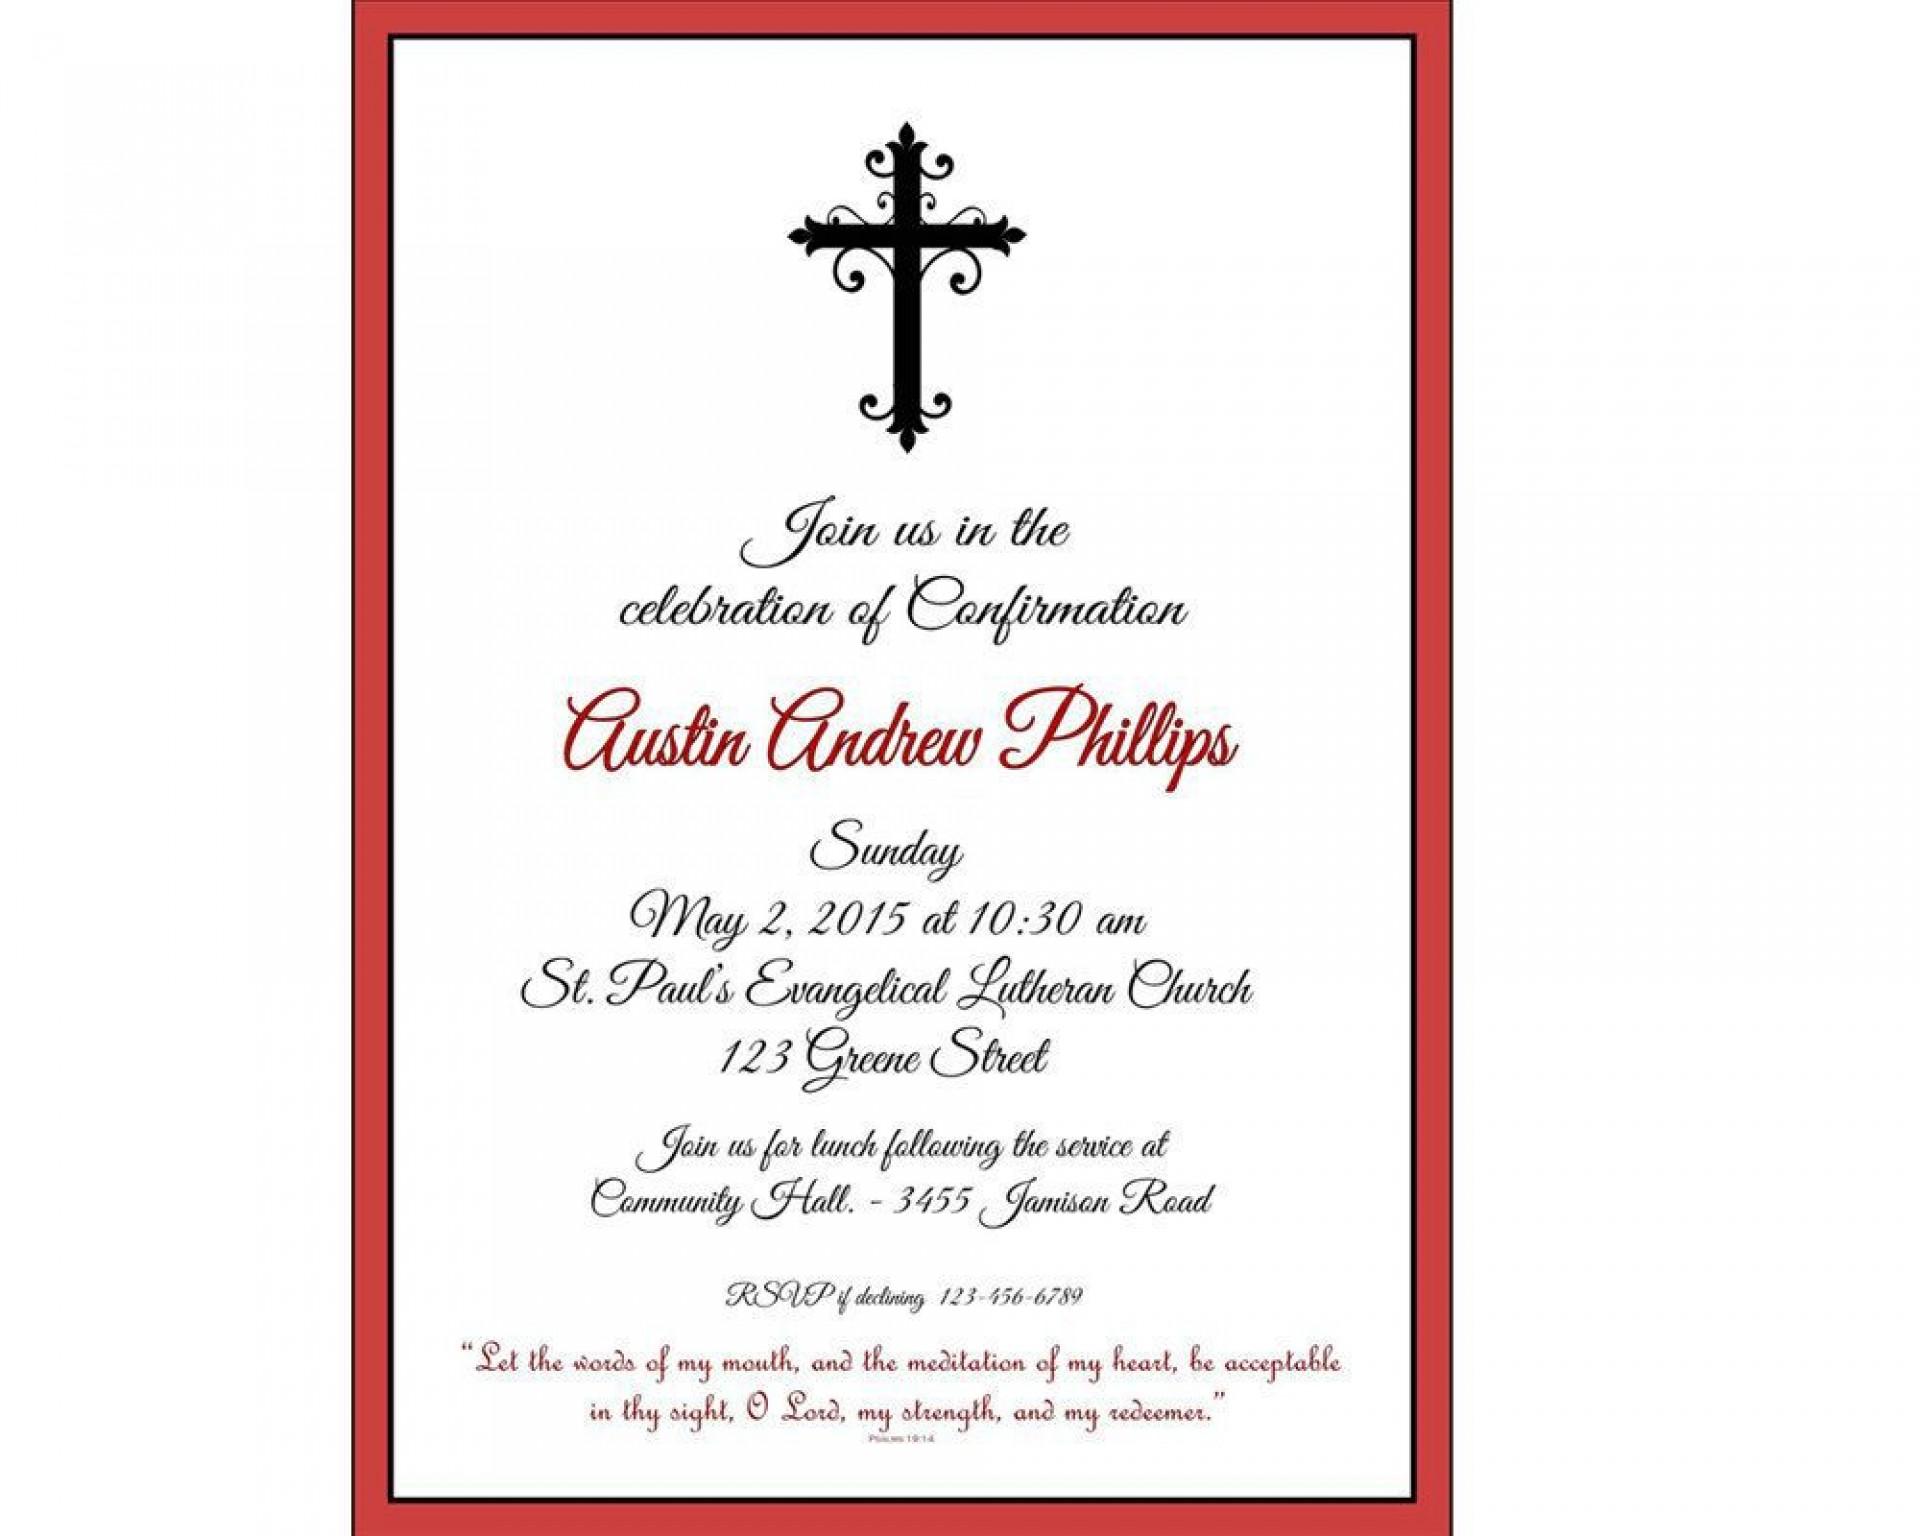 004 Formidable Free Religiou Invitation Template Printable Inspiration 1920